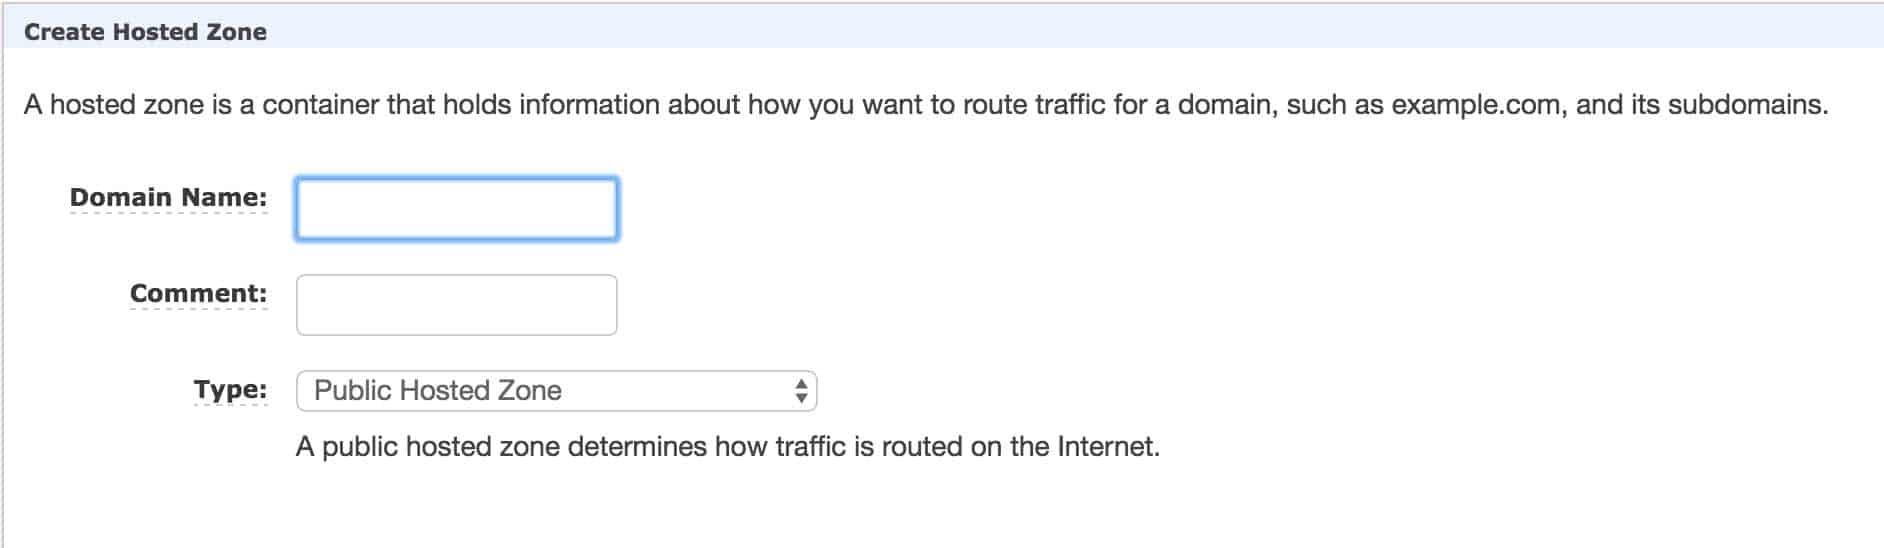 hostedzone-domain-name